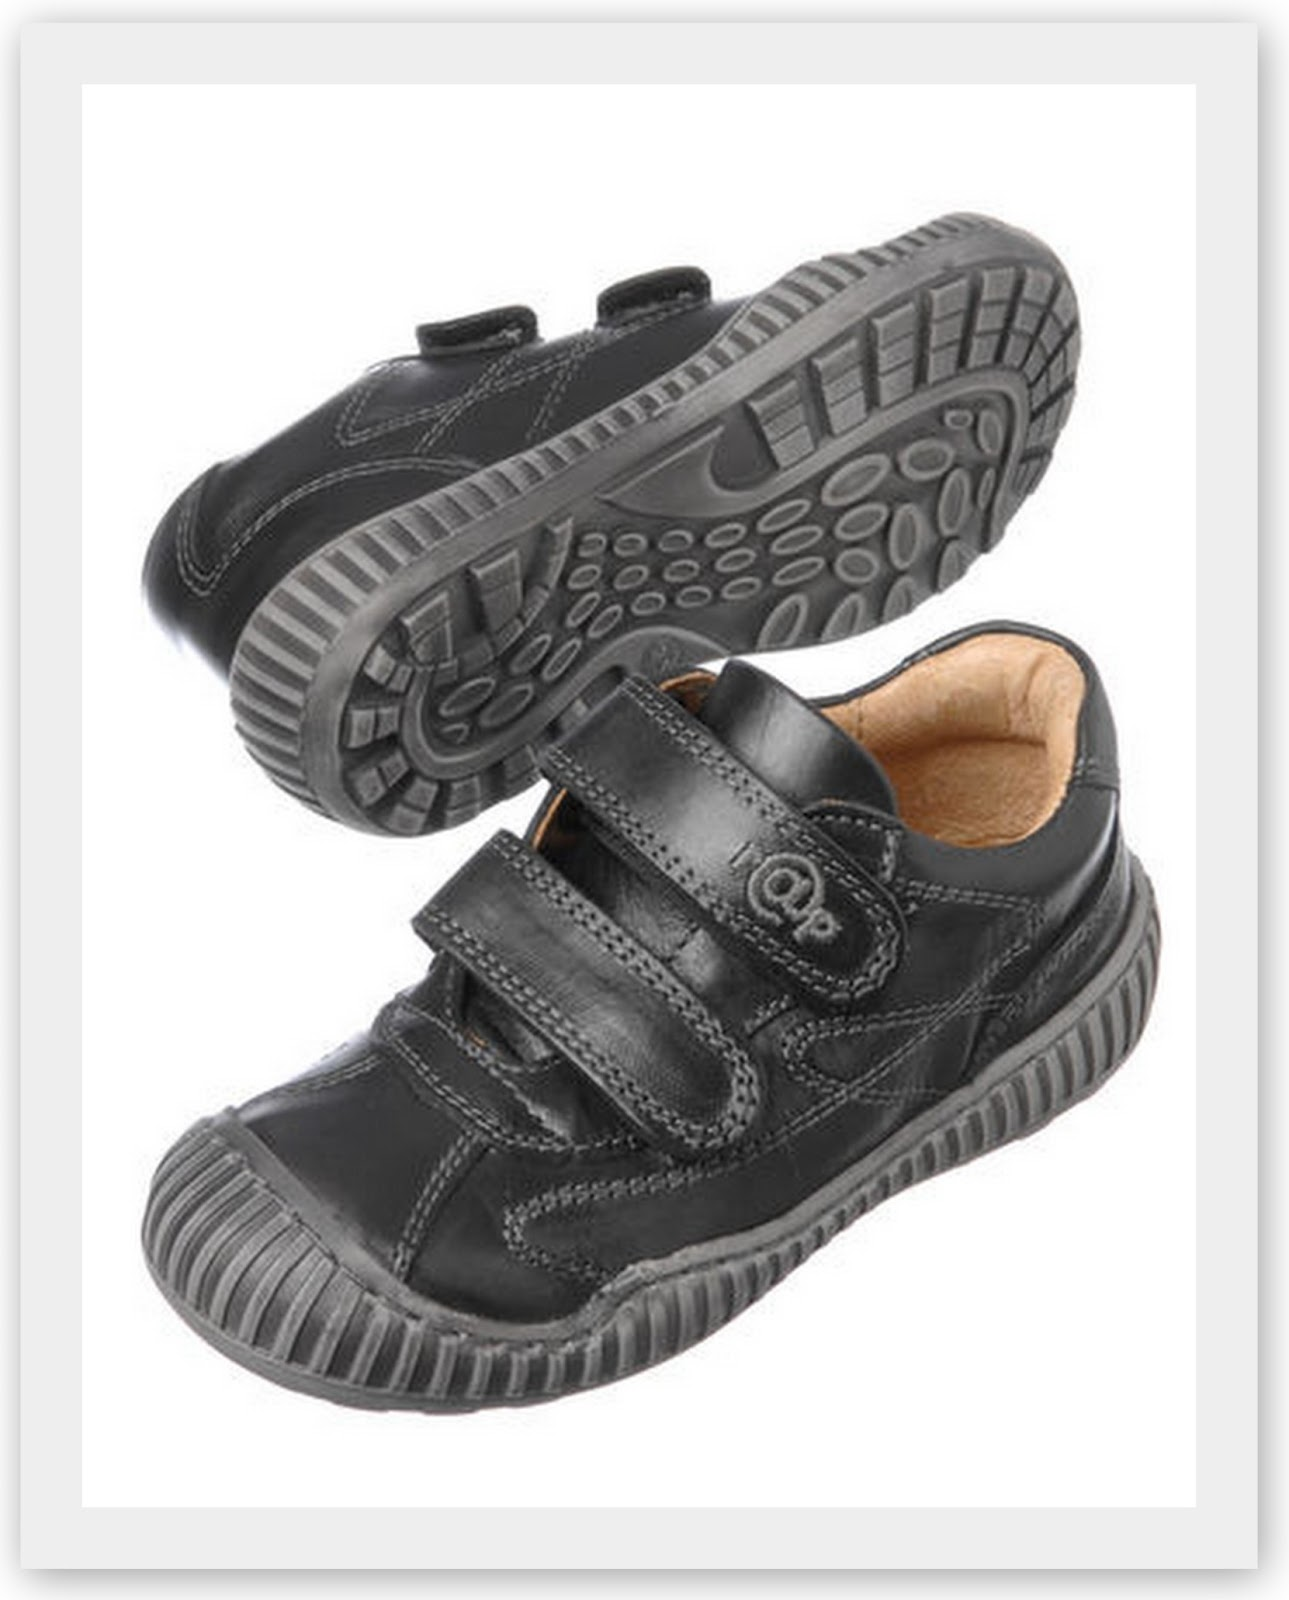 6ed8aaa5692 Vind – Arauto Rap sko og sandaler | pforpernille